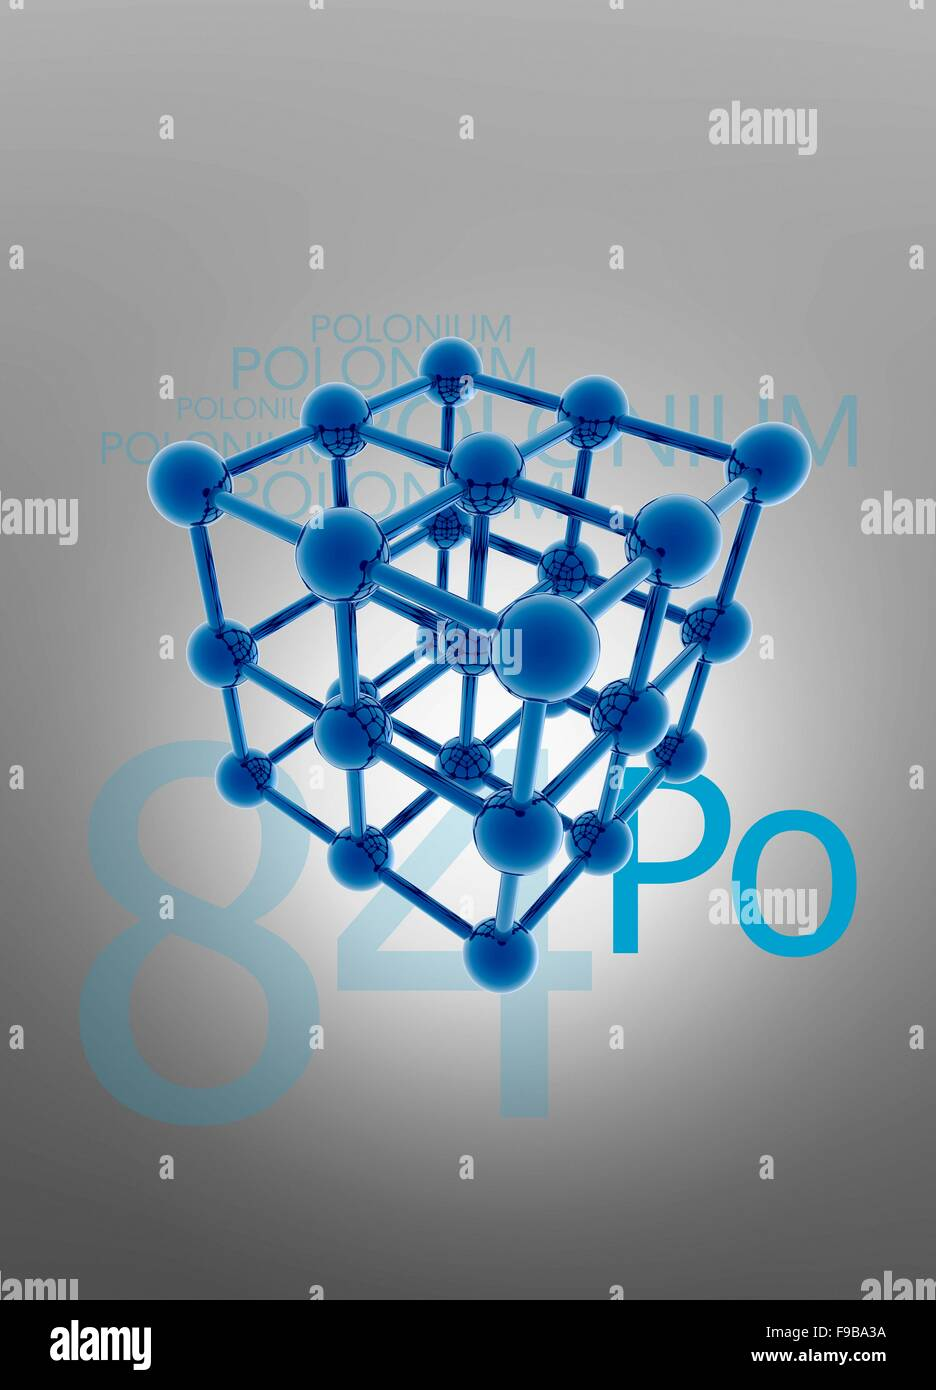 Polonium Atom Diagram Wiring Fuse Box Oxygen Structure Stock Photo Atomic Computer Illustration Rh Alamy Com Mercury